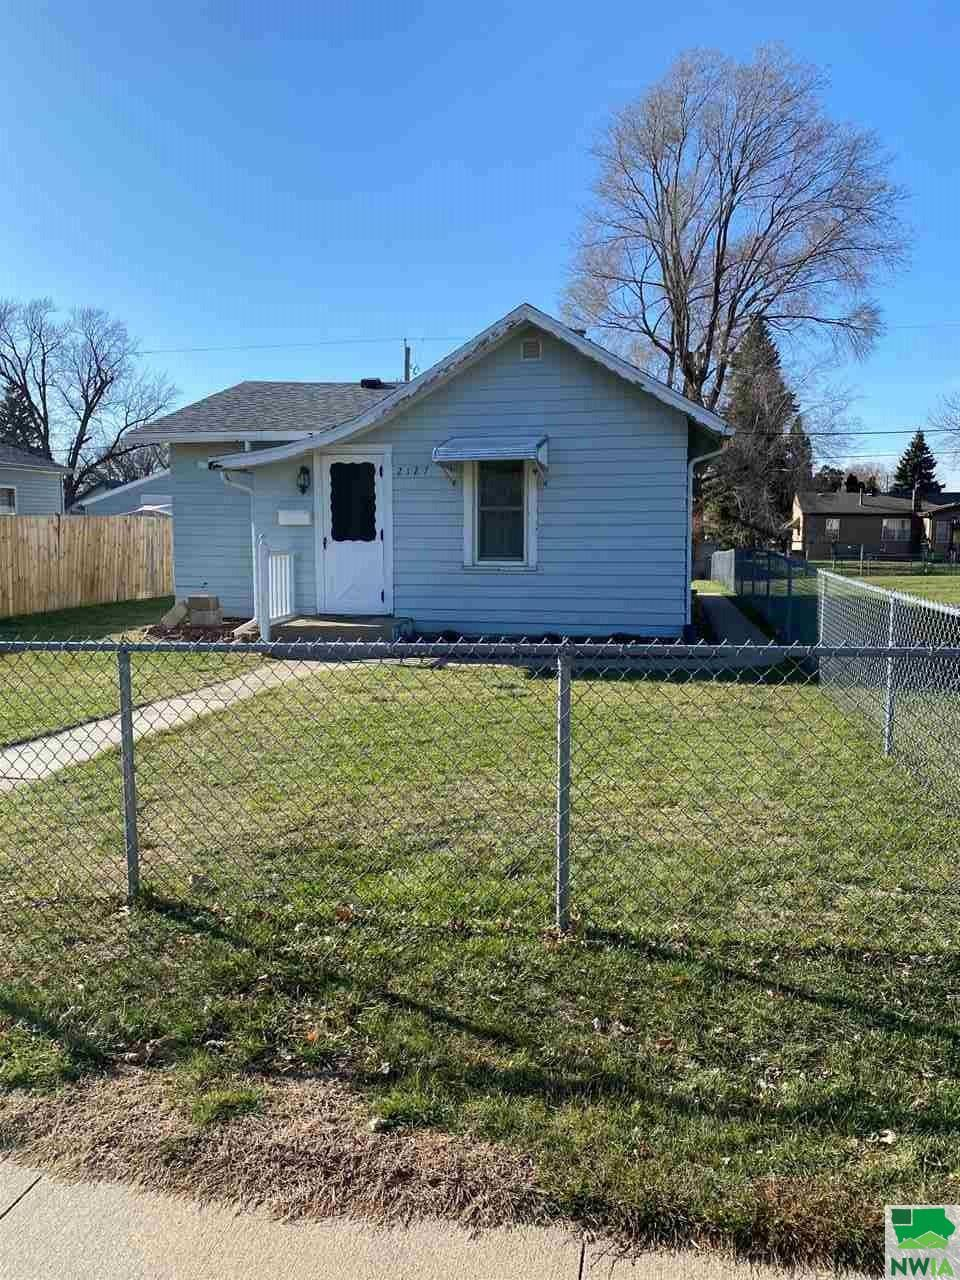 Photo for 2127 Dewey St, Sioux City, IA 51109 (MLS # 811503)